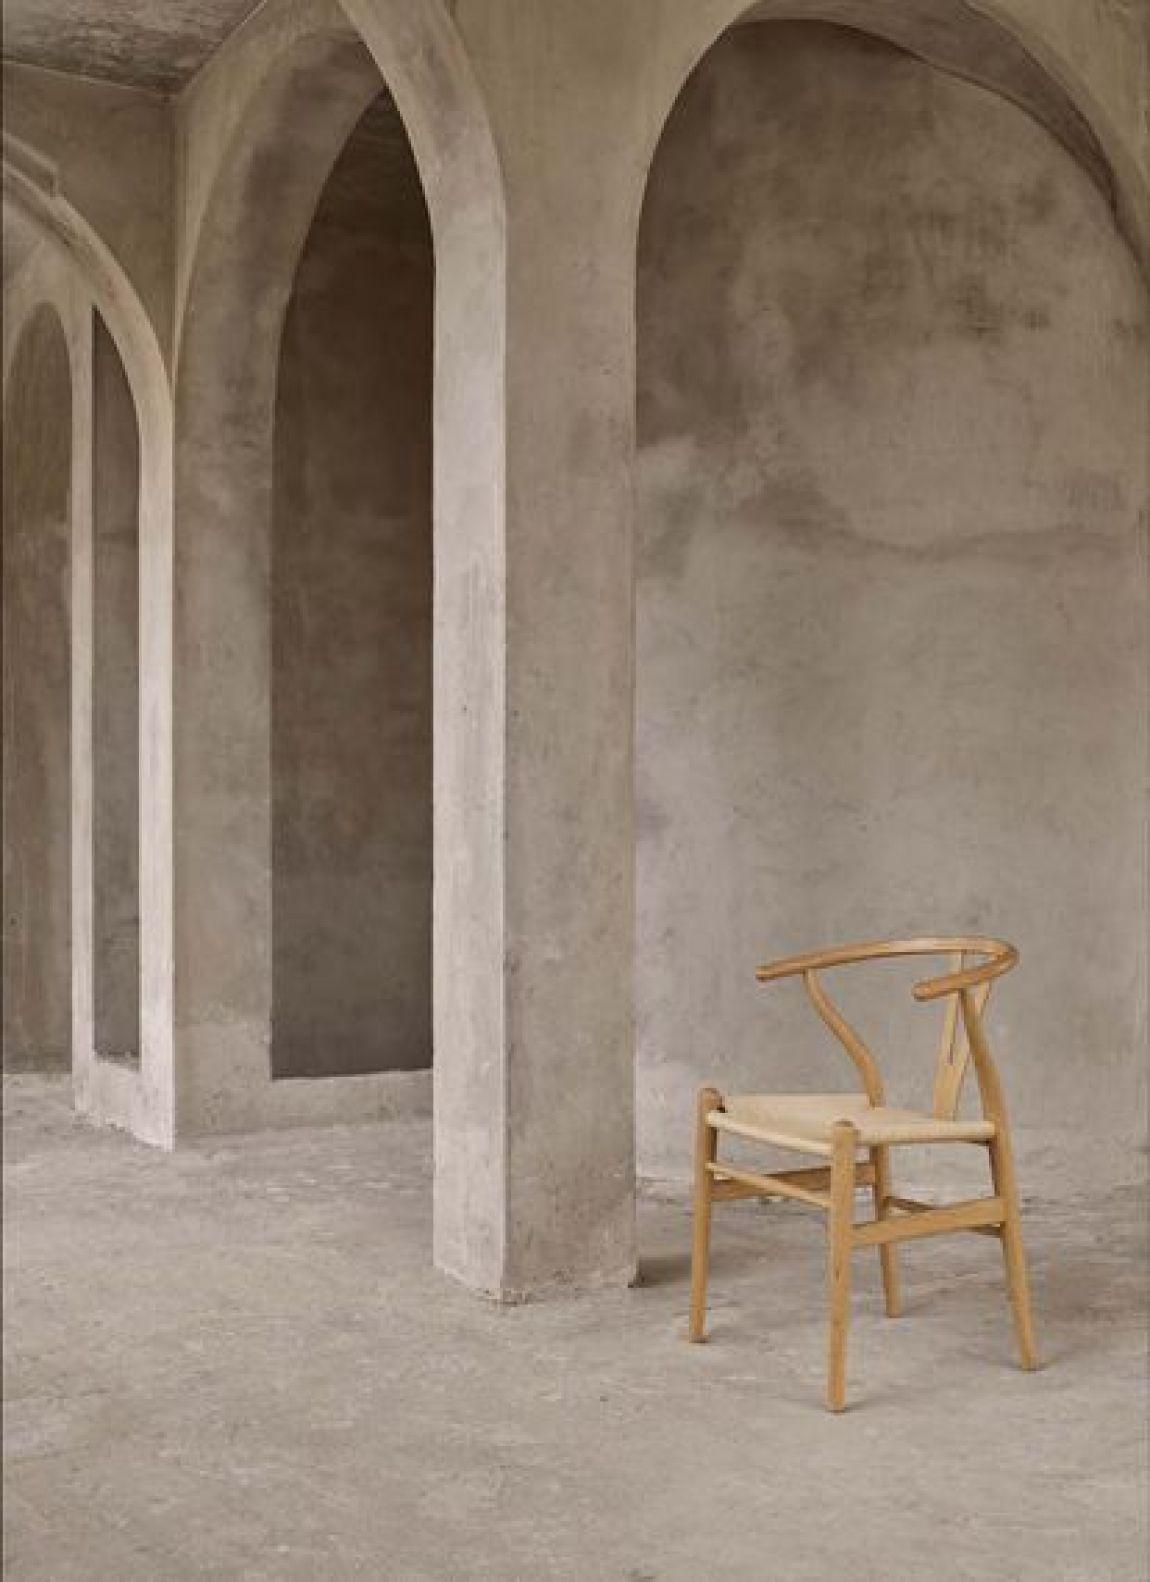 Wishbone Chair by Hans J. Wegner relaunched by Carl Hansen.